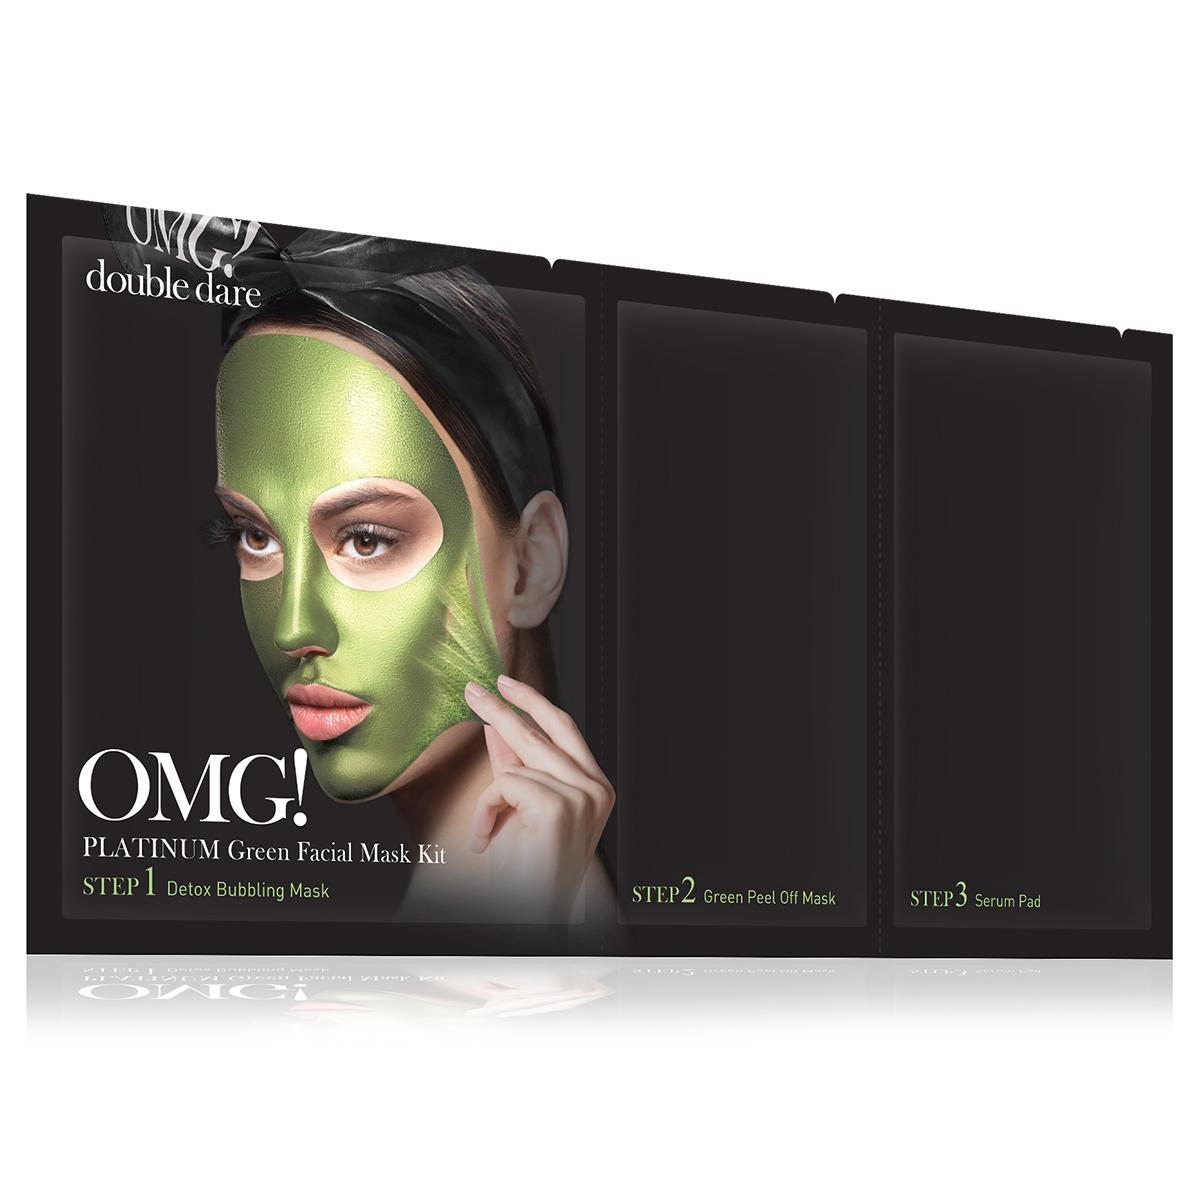 Double Dare OMG! Platinum Green Facial Mask Kit Маска трехкомпонентная для ухода за кожей лица зеленая маска пленка для придания упругости коже лица health